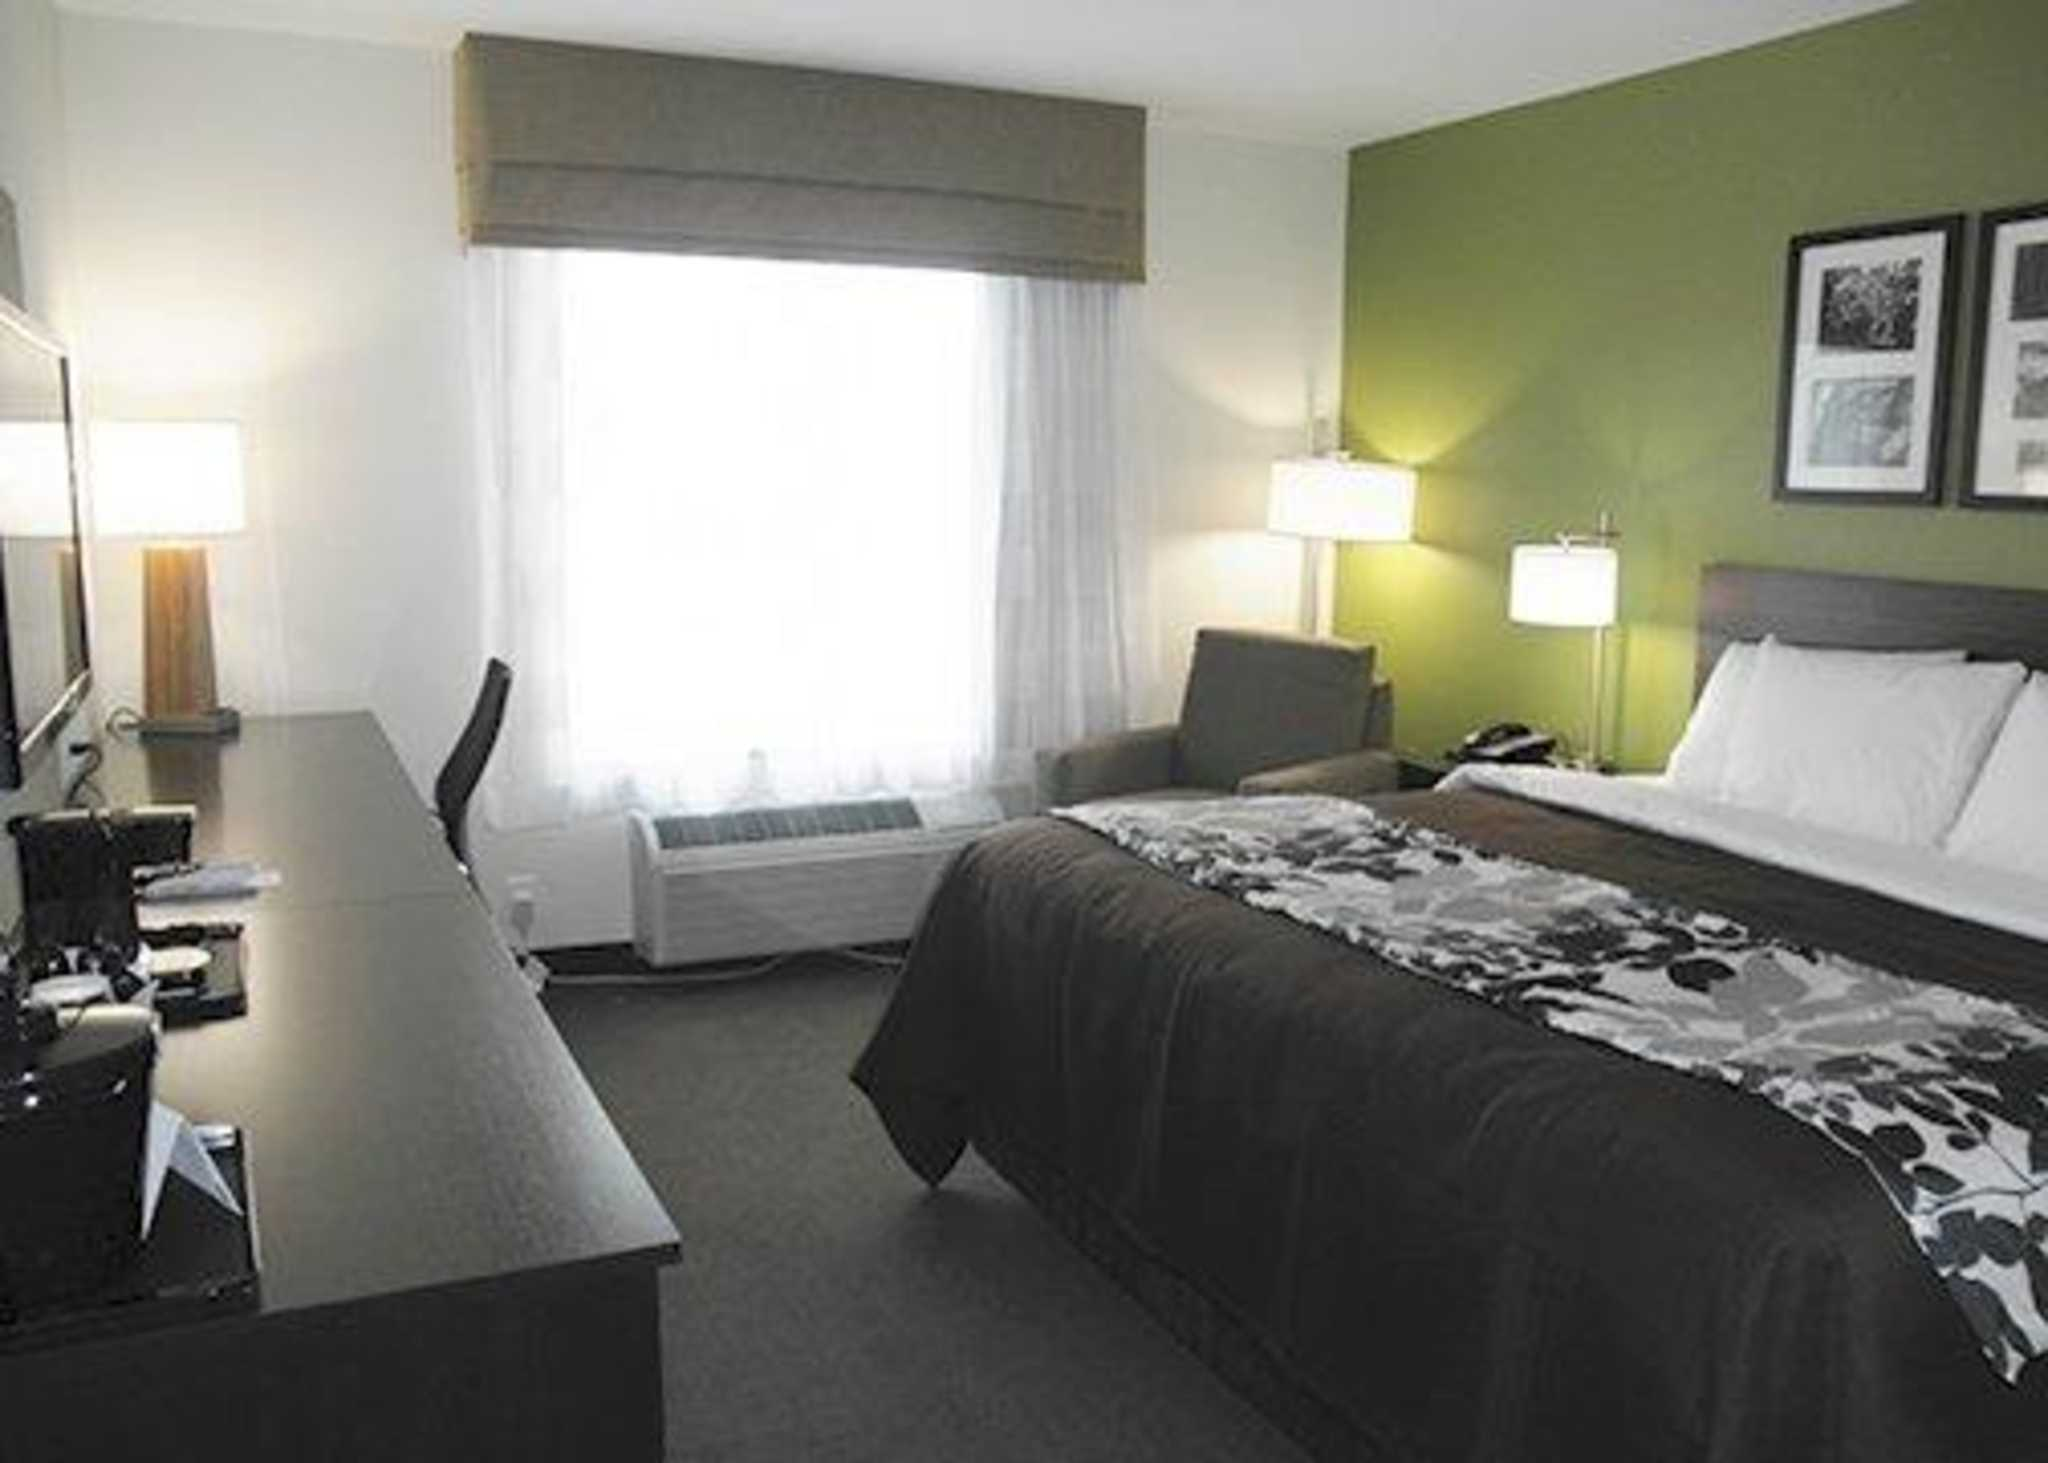 Sleep Inn & Suites Belmont / St. Clairsville image 1